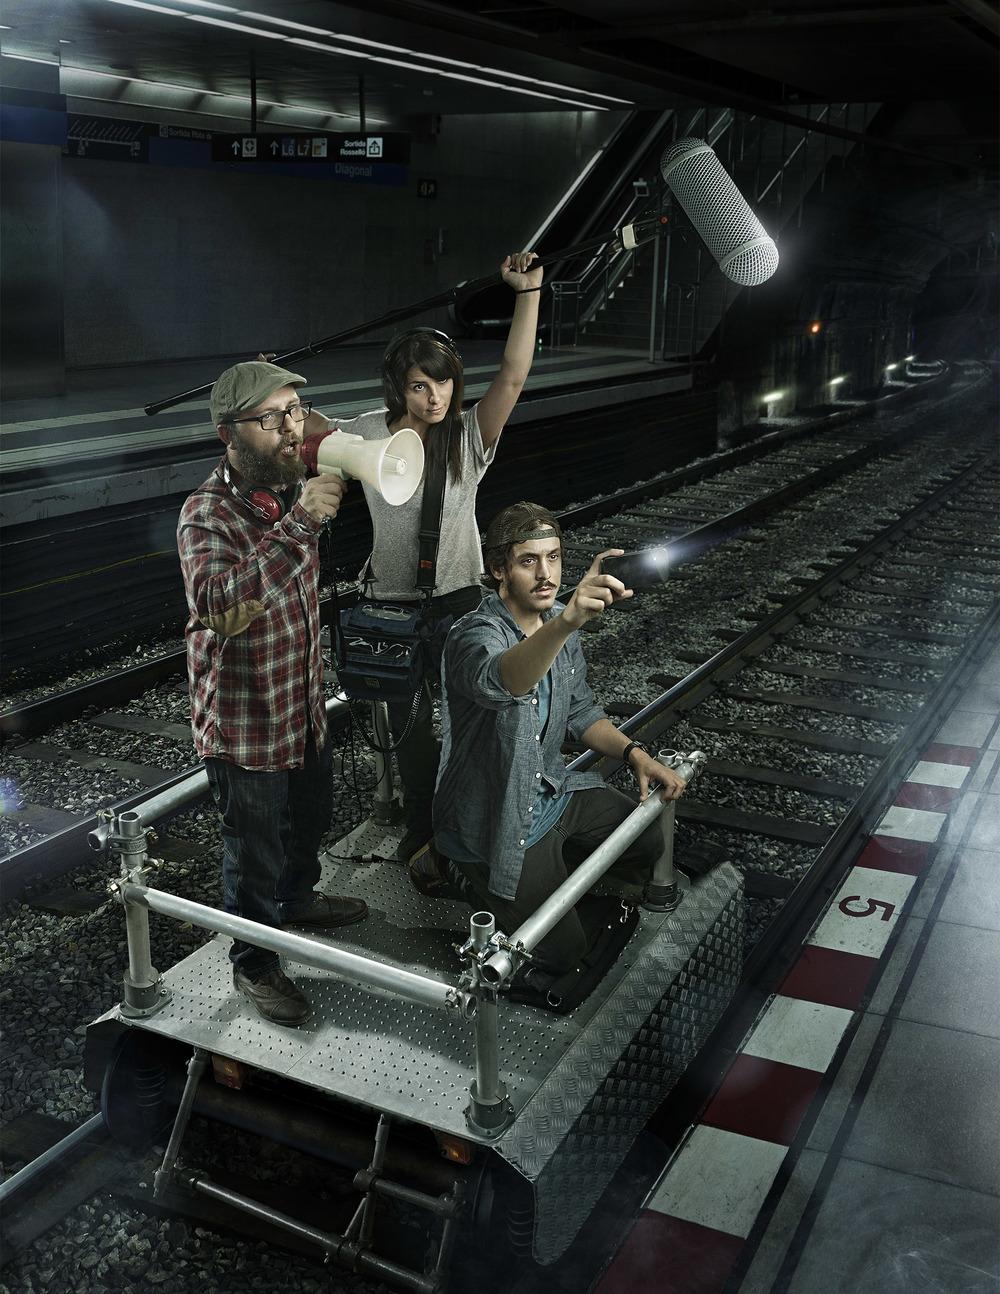 Client:  TMB  Subtravelling Festival poster, A film festival inside Barcelona Subway.   Agency:  Ogilvy One   Retouch:  Lucas Pigliacampo